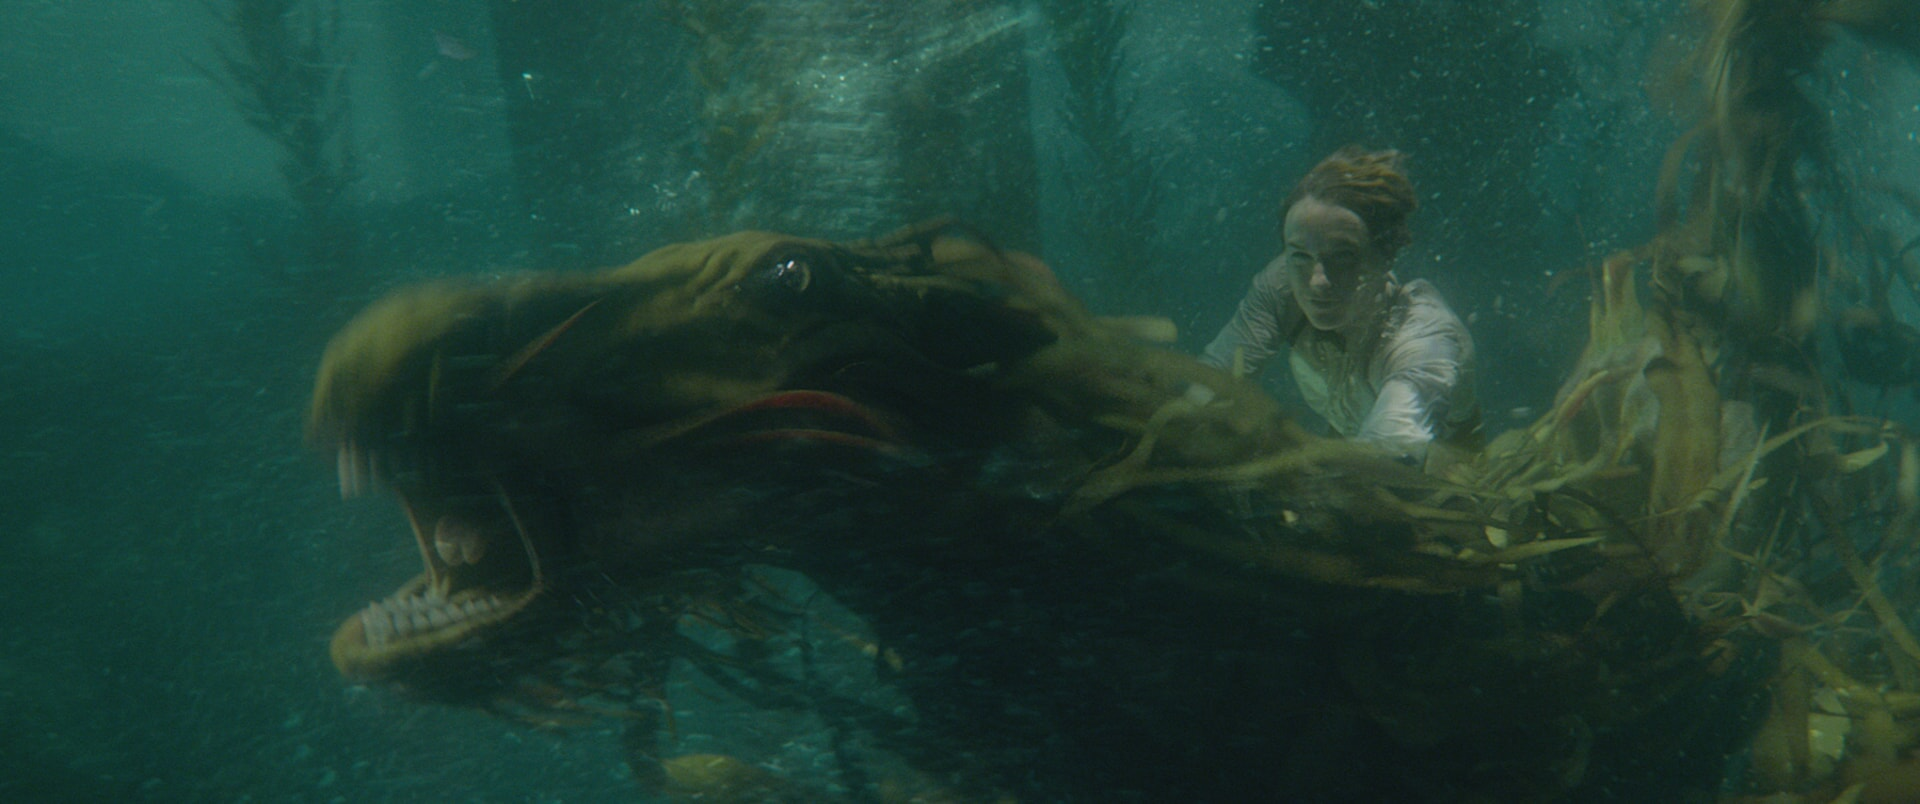 "EDDIE REDMAYNE as Newt Scamander in Warner Bros. Pictures' fantasy adventure ""FANTASTIC BEASTS: THE CRIMES OF GRINDELWALD,"" a Warner Bros. Pictures release."